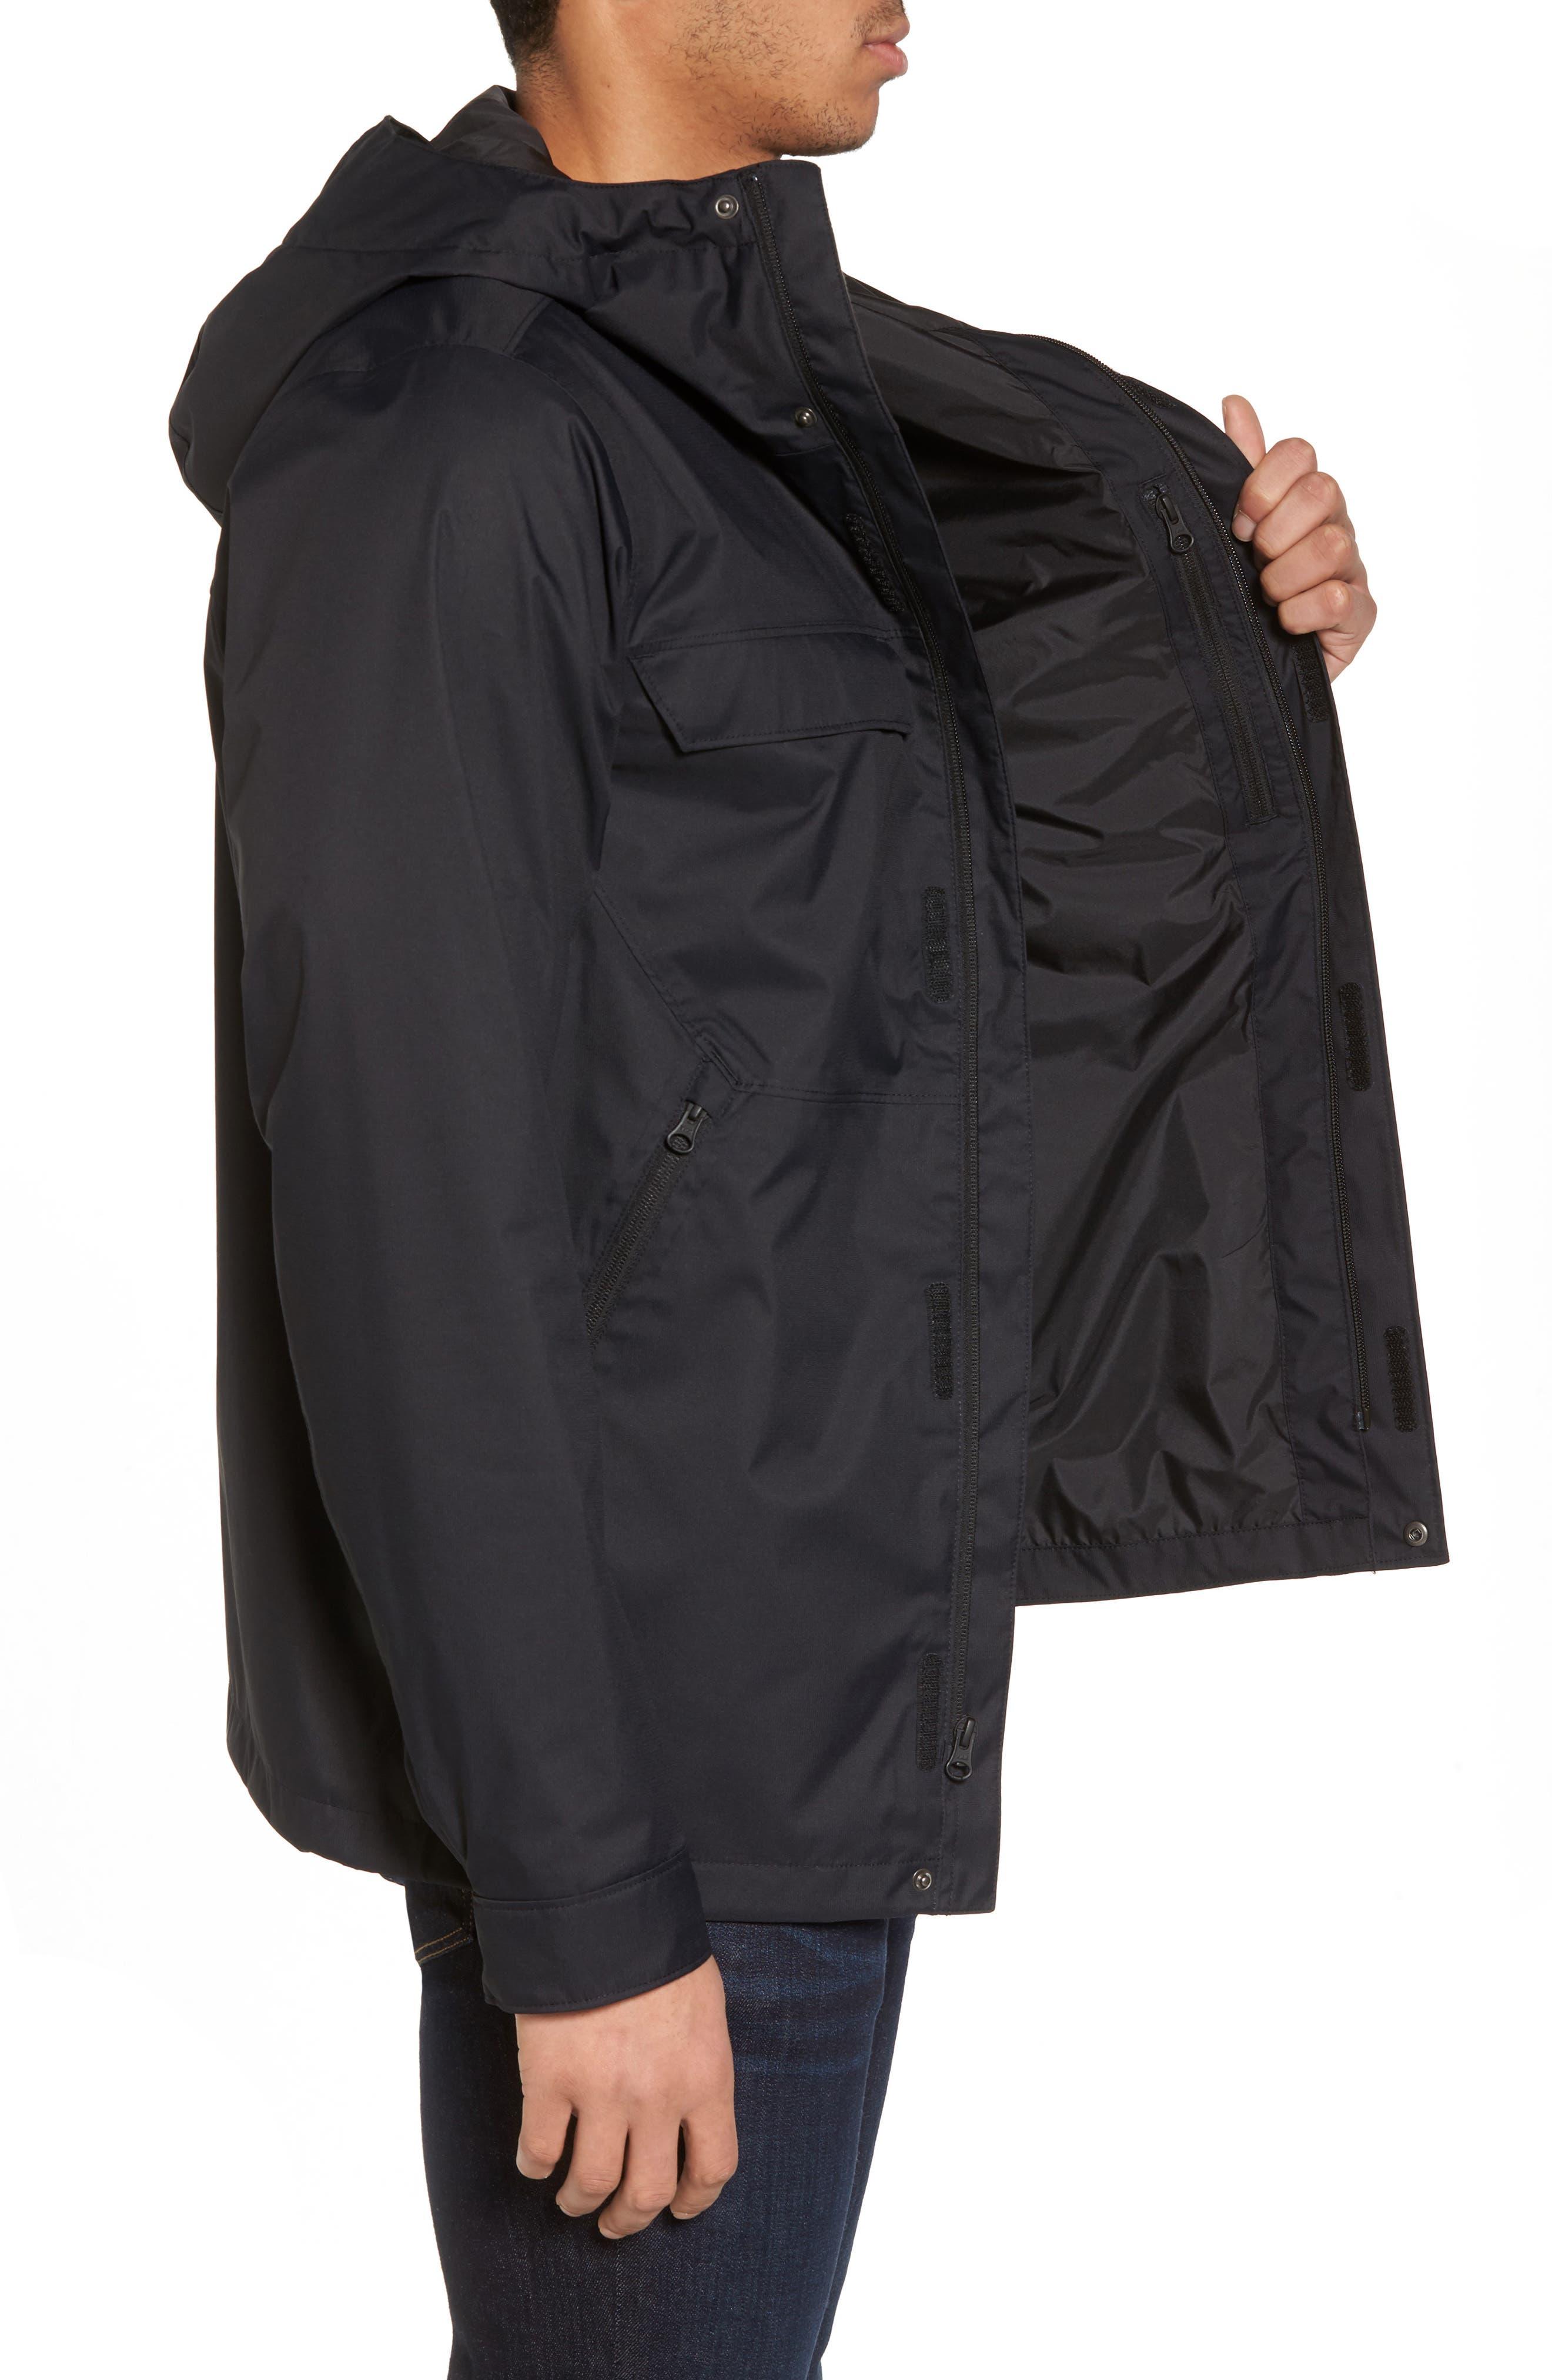 Jenison II Insulated Waterproof Jacket,                             Alternate thumbnail 3, color,                             Tnf Black